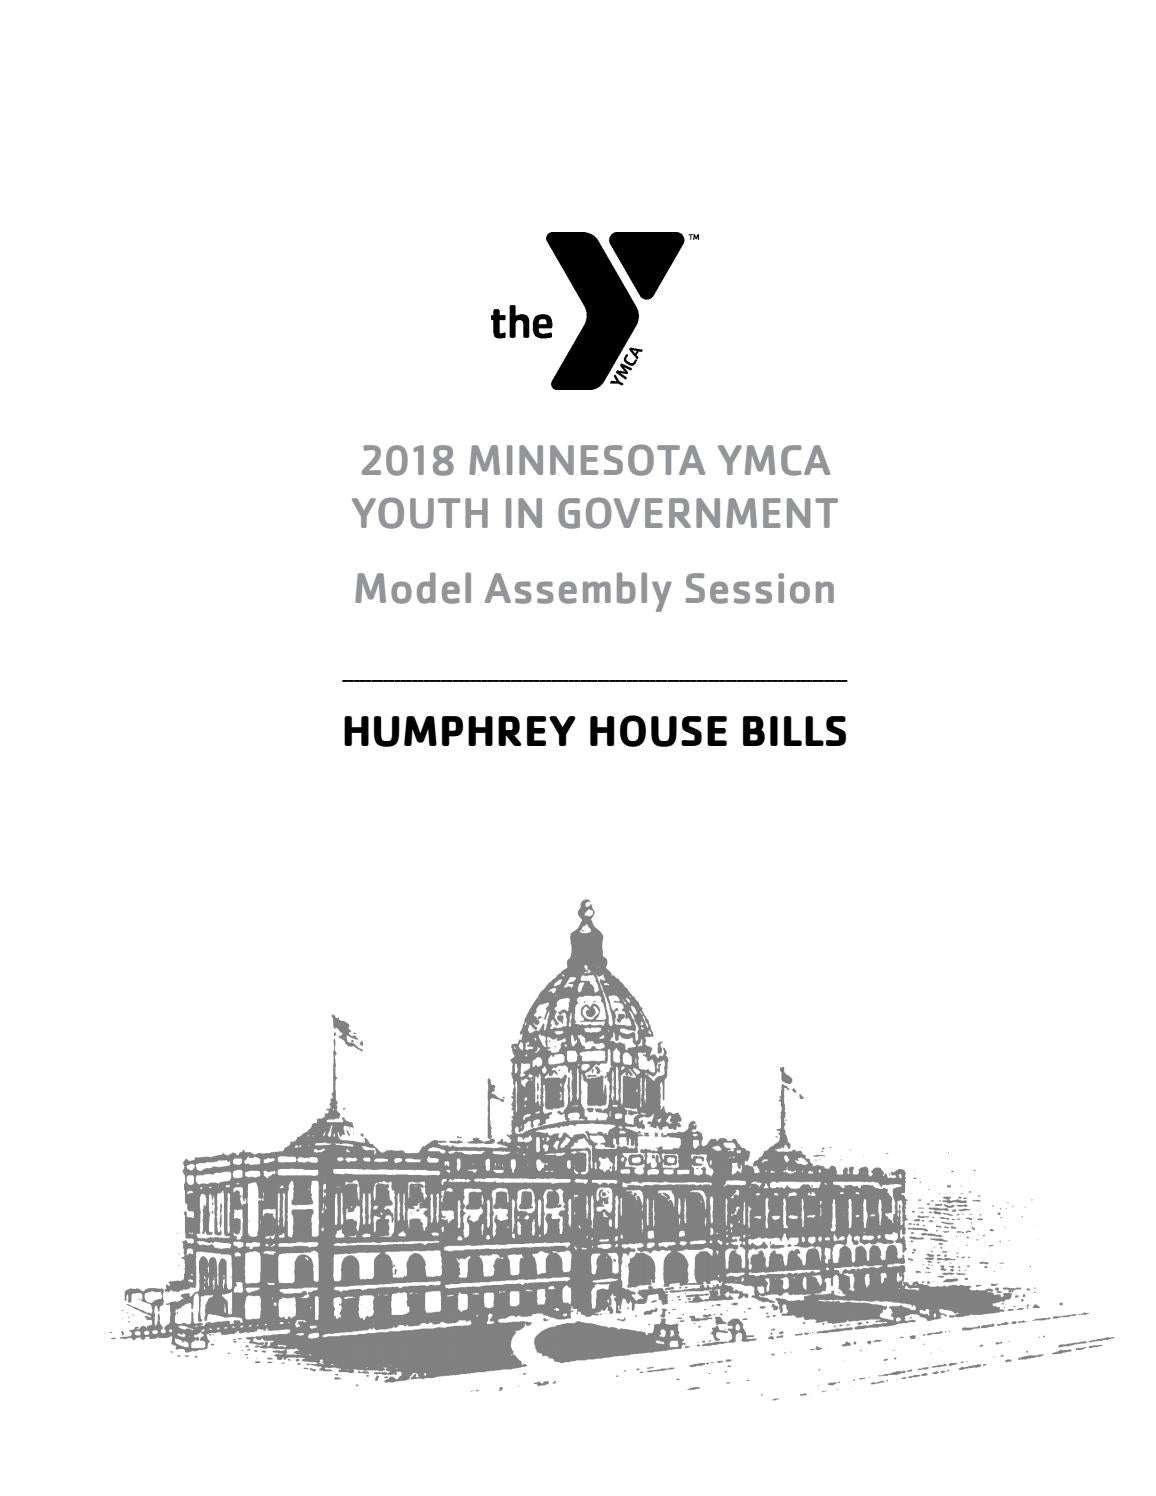 2018 Humphrey House Bills by Minnesota YMCA Youth in